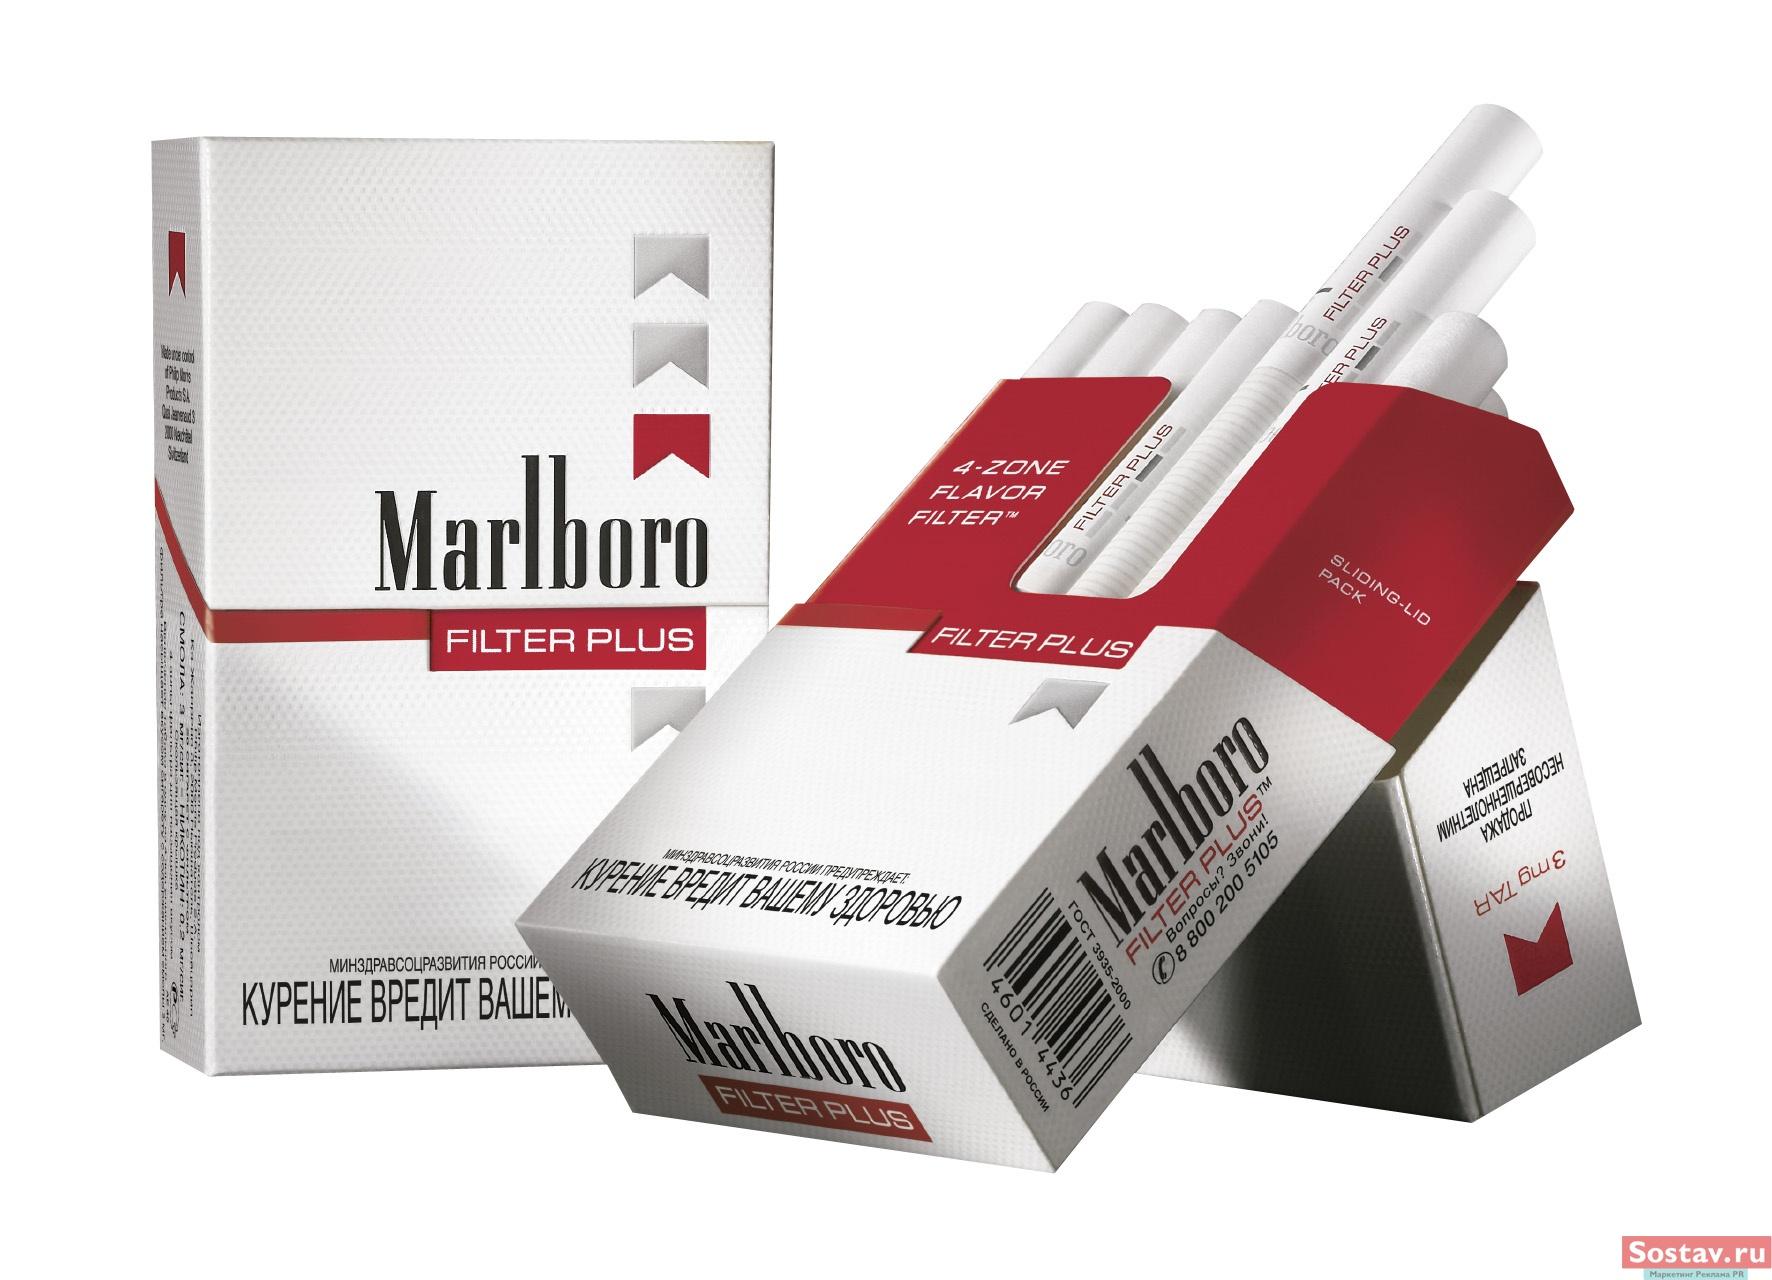 Marlboro Filter Plus High Resolution Hd Wallpaper Of General 1772x1280